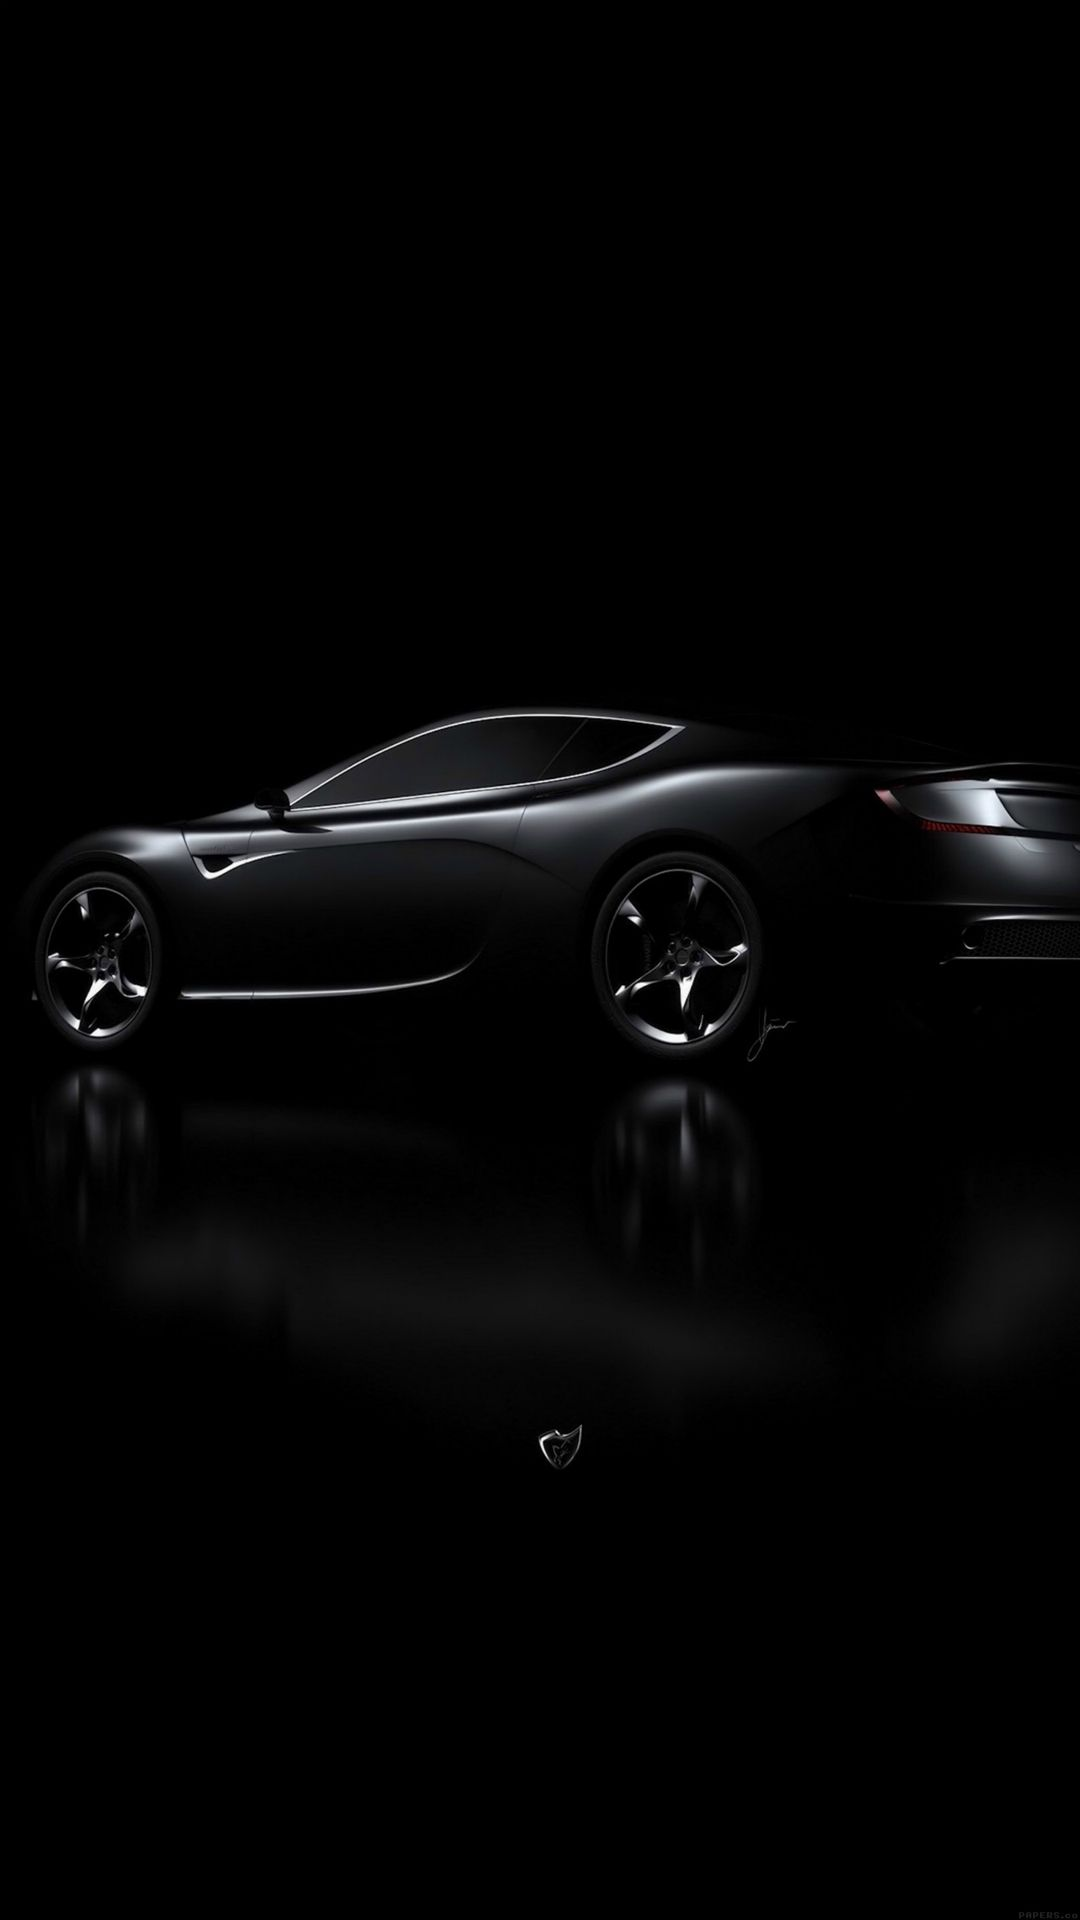 Aston Martin Black Car Dark iPhone 6 Wallpaper Download iPhone 1080x1920